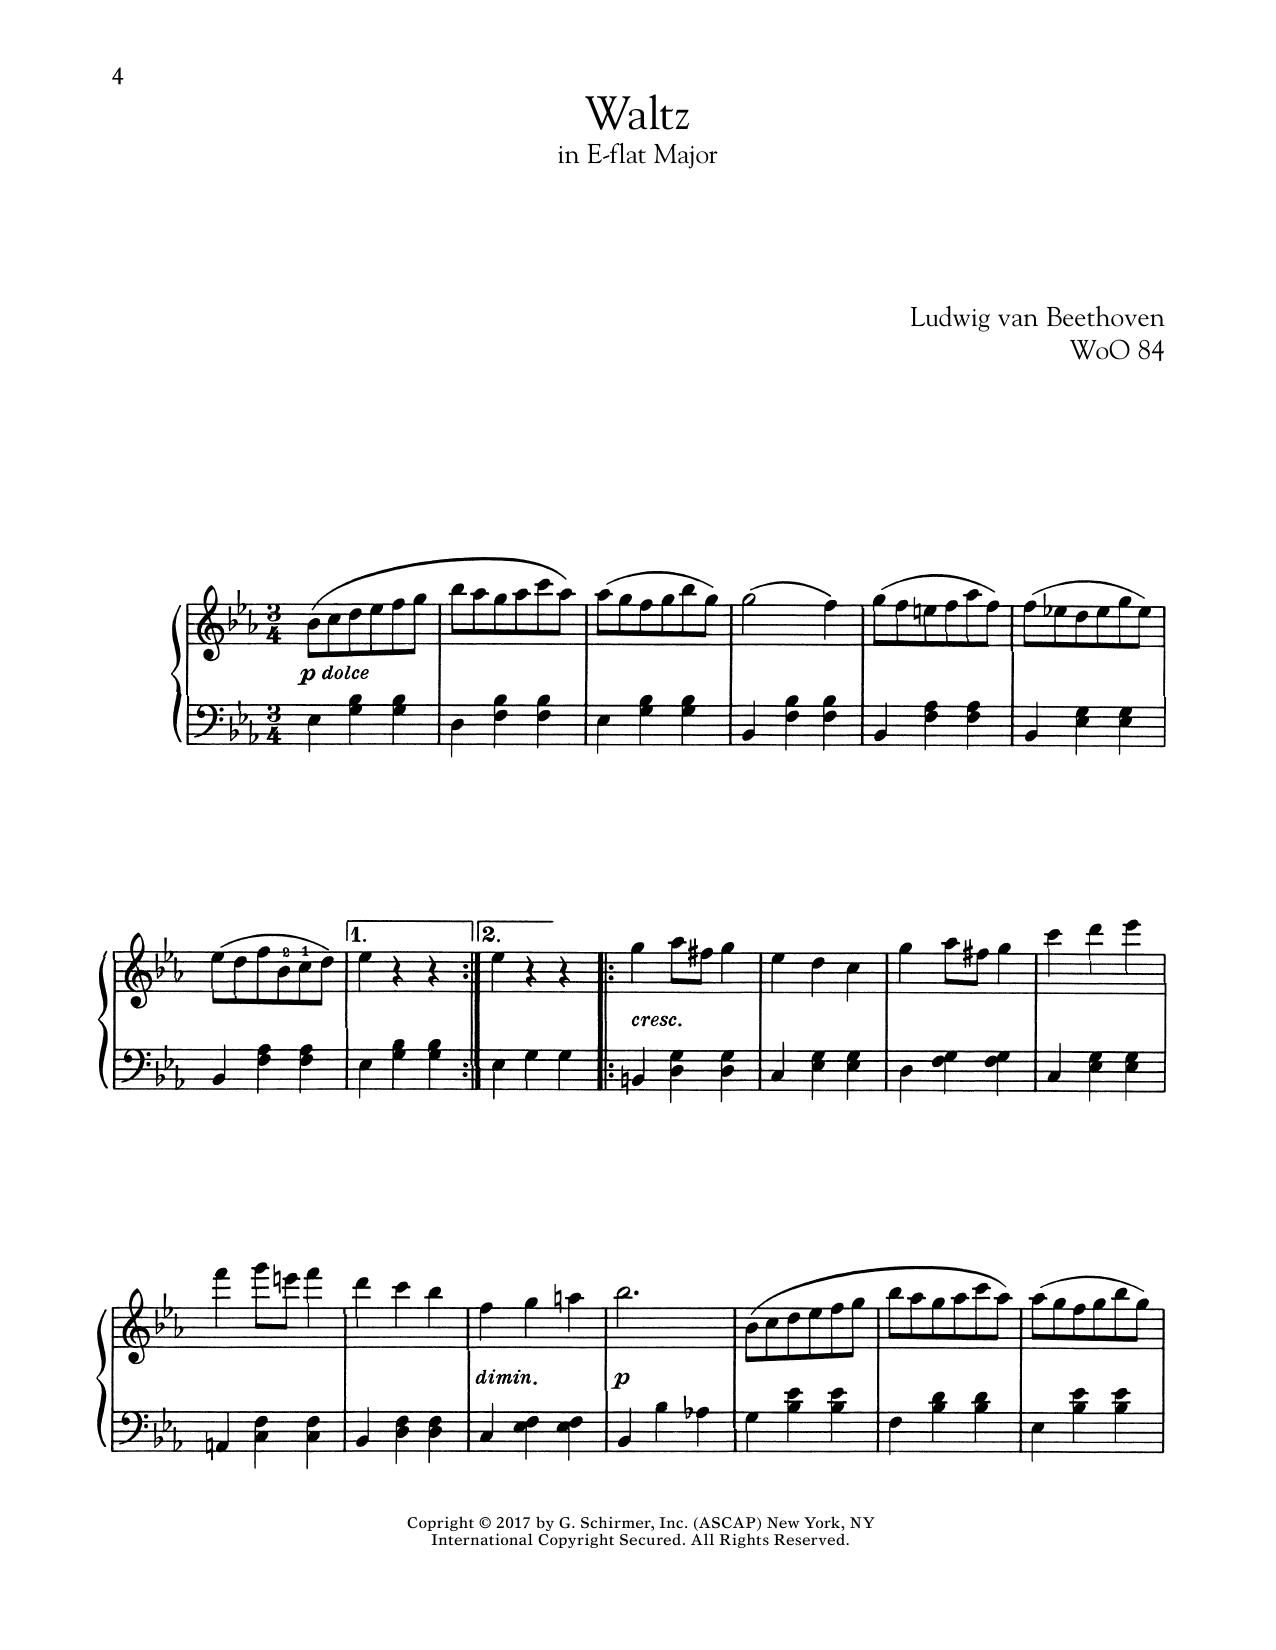 Waltz In E-Flat Major, WoO 84 (Piano Solo)